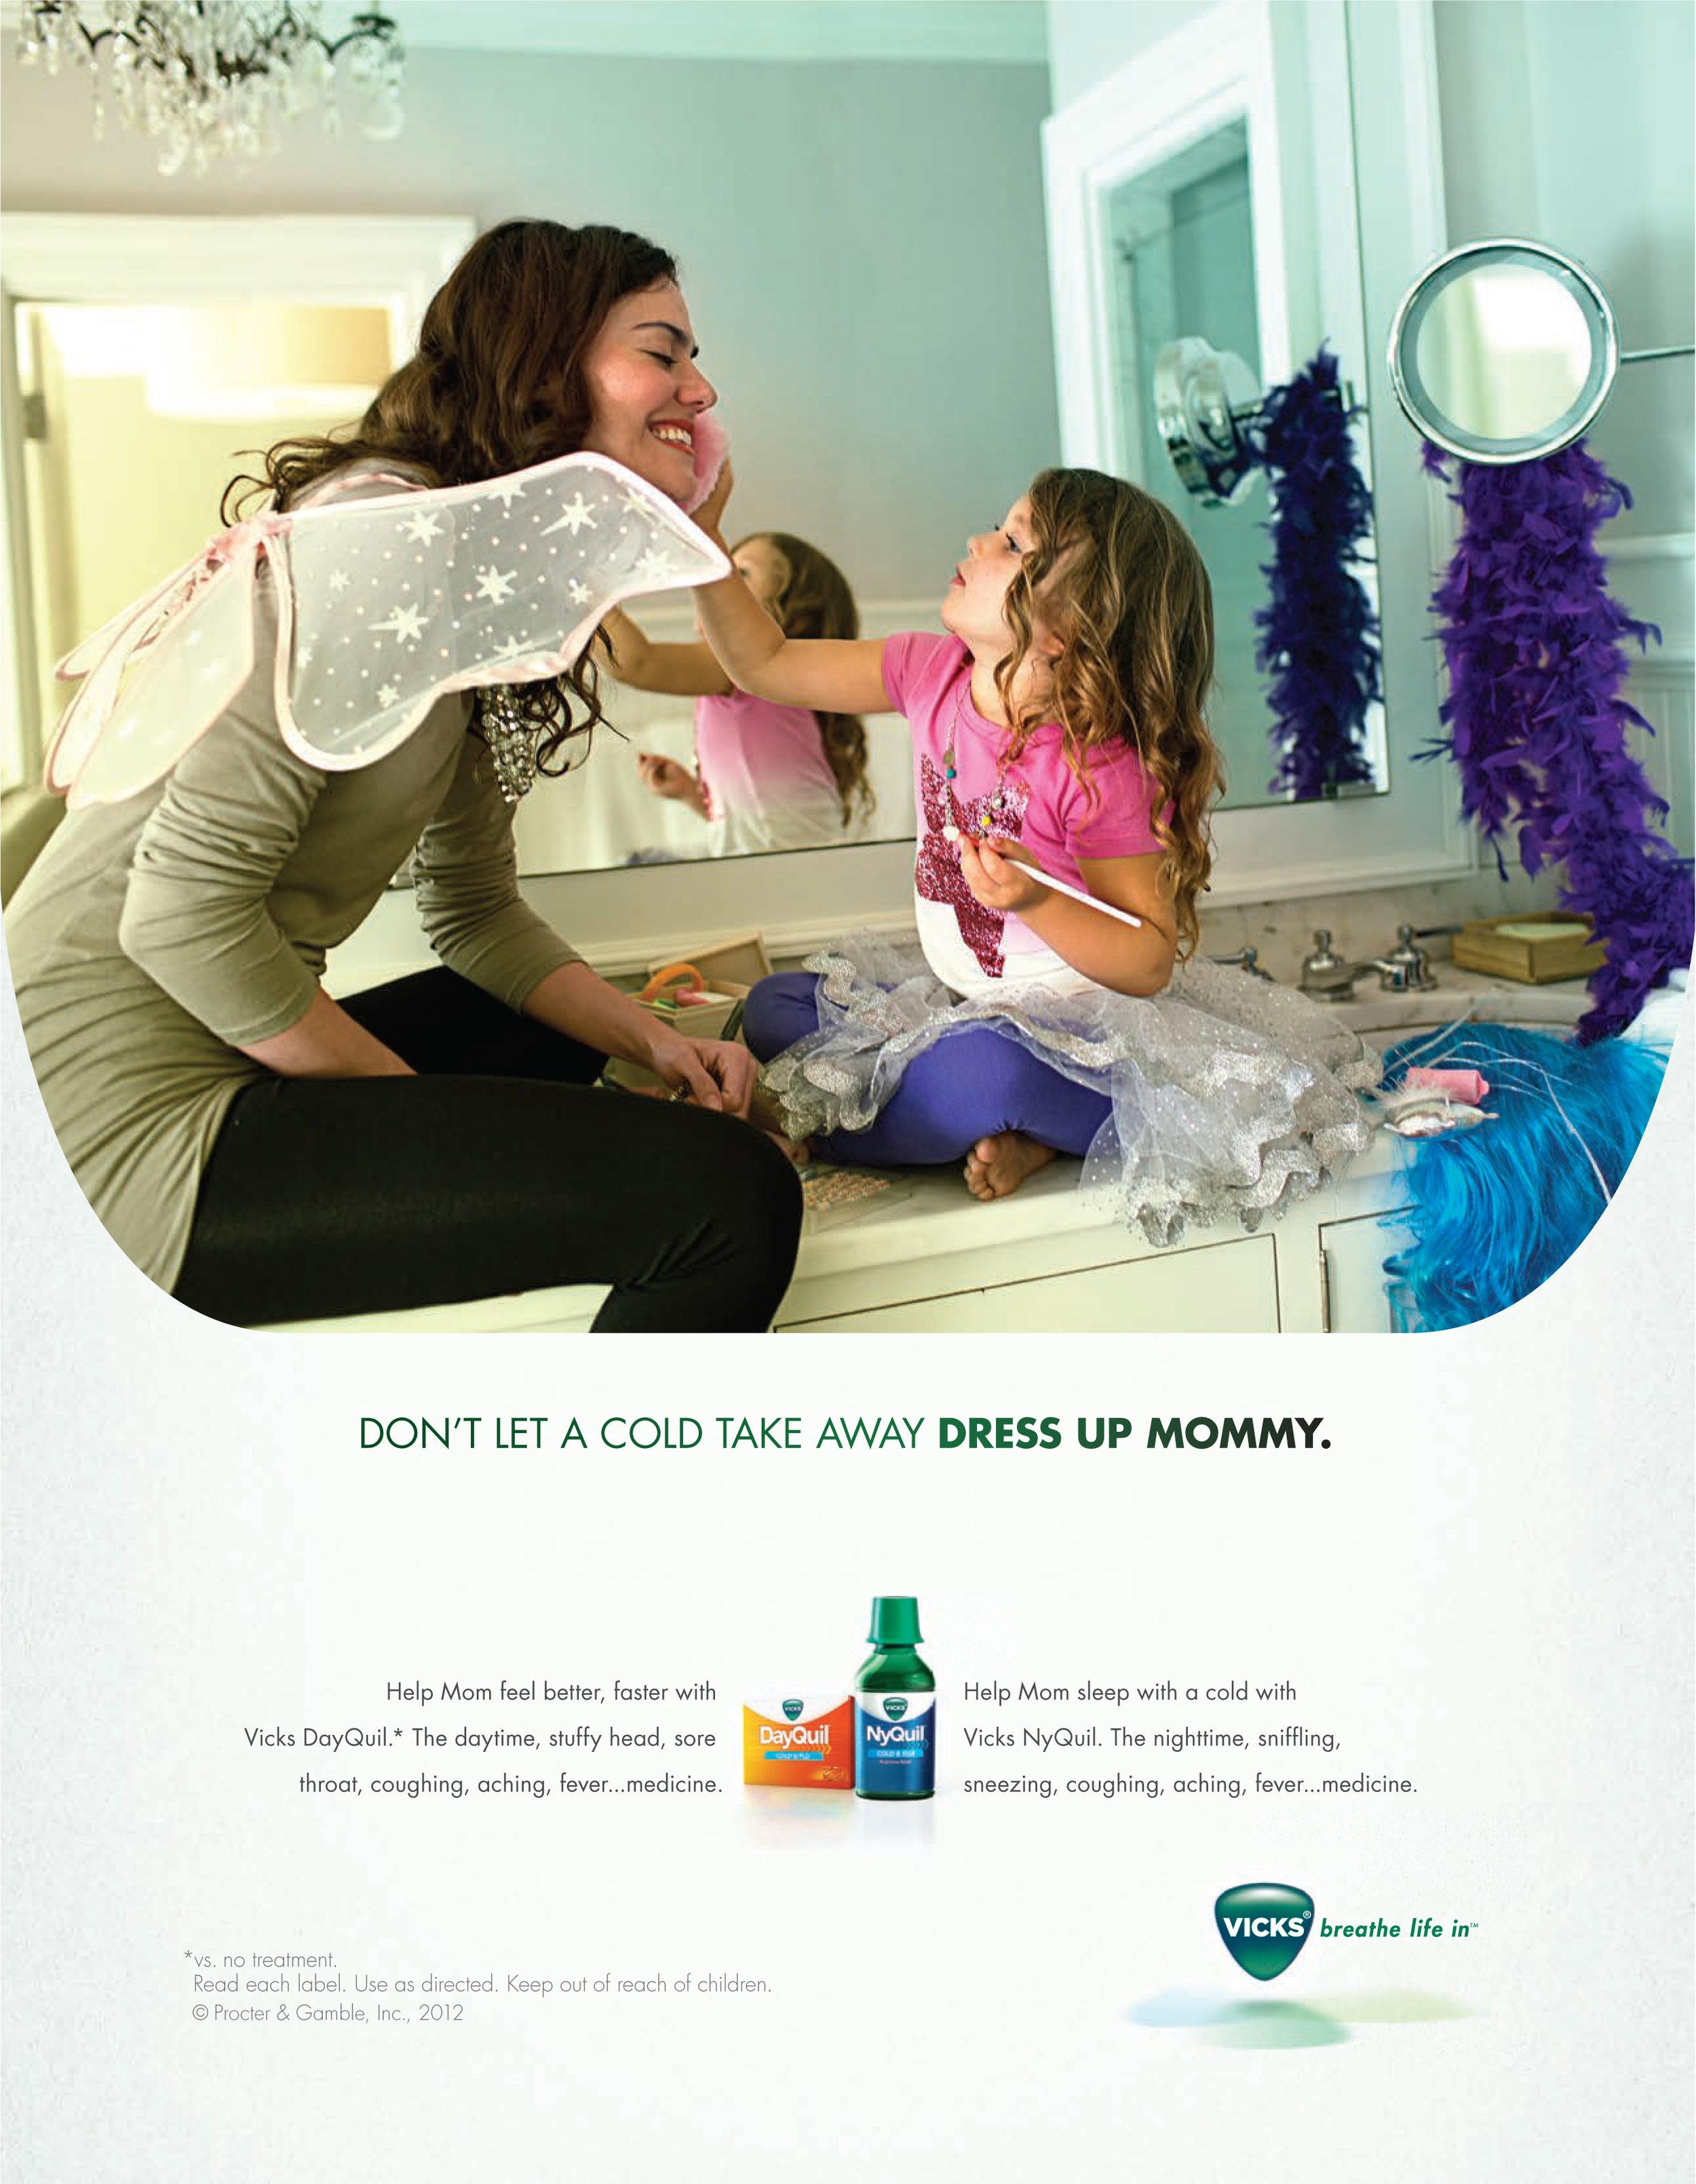 vicks ad_dress up mommy.jpg